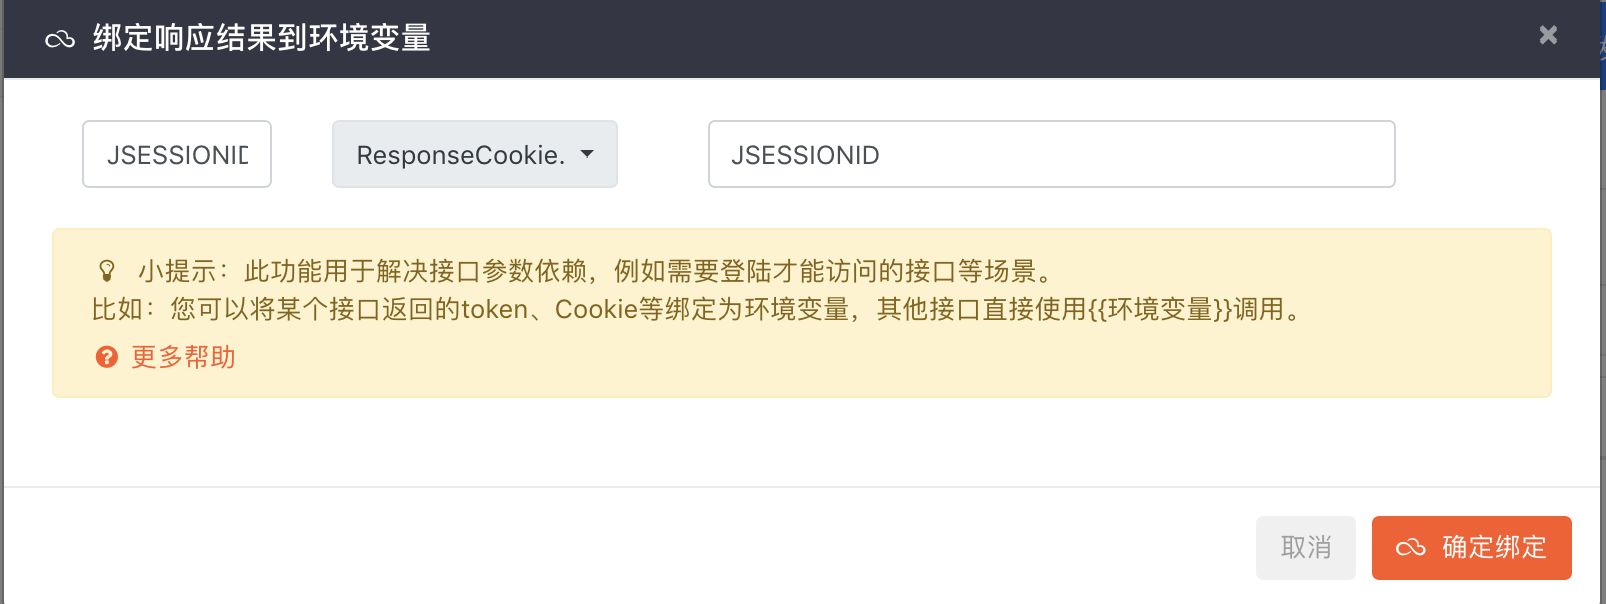 使用apipost测试验证码接口发现请求发了两次且无法正确存储session